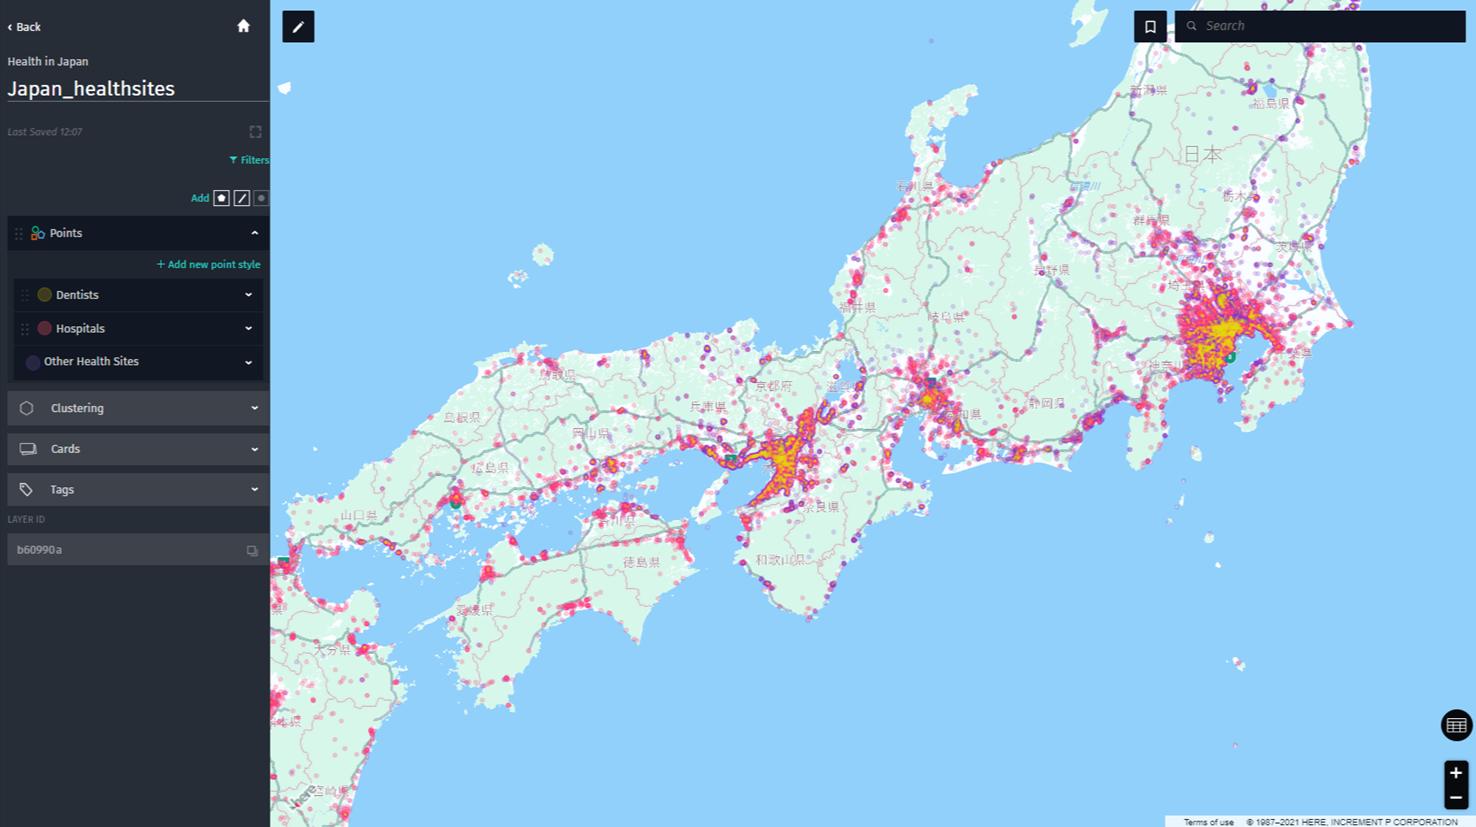 Japan-healthsites created with Studio on HERE platform